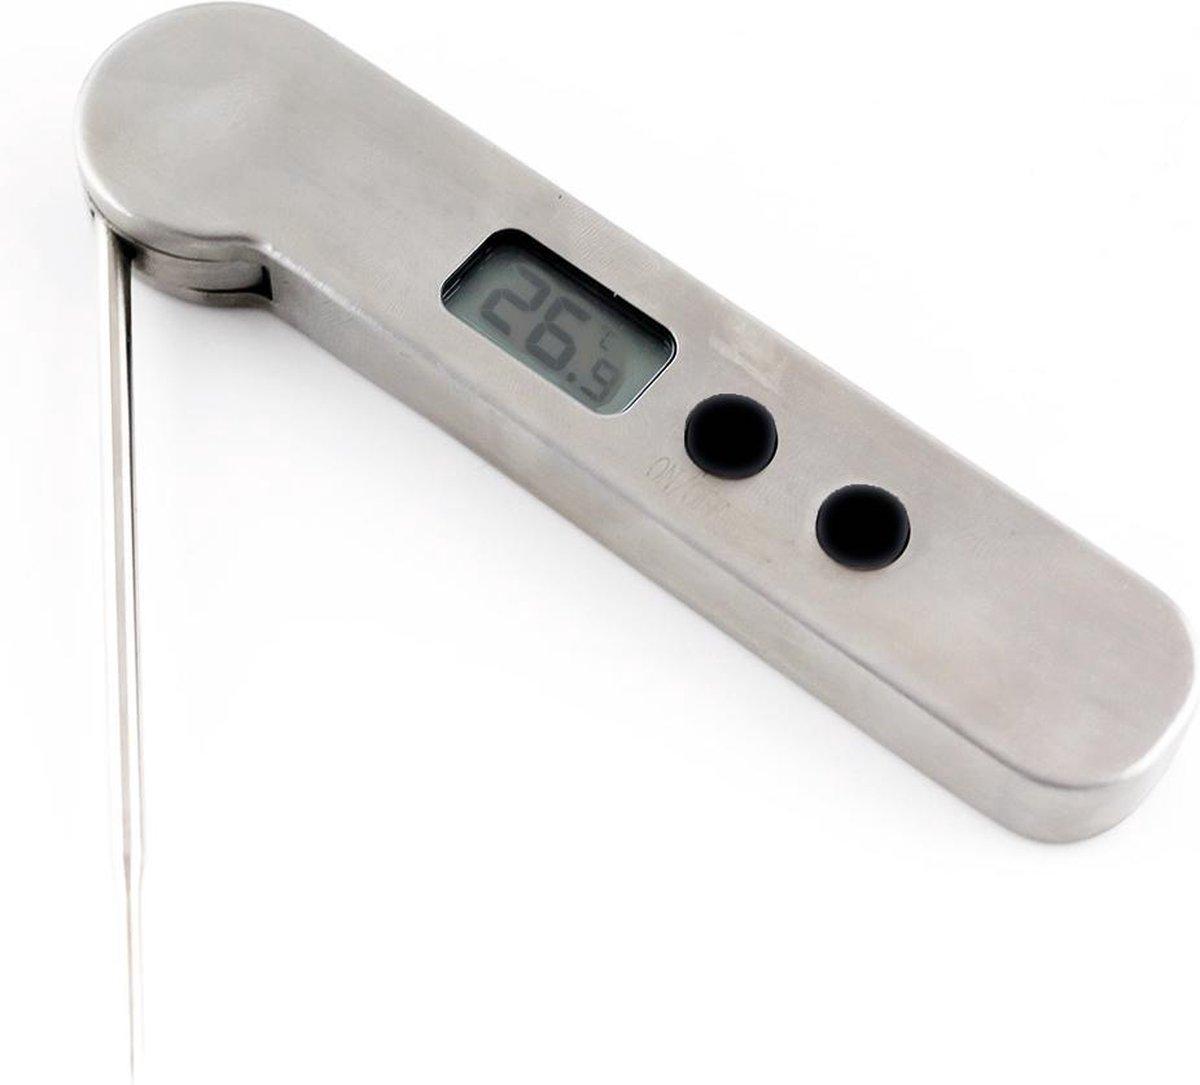 The Bastard core thermometer